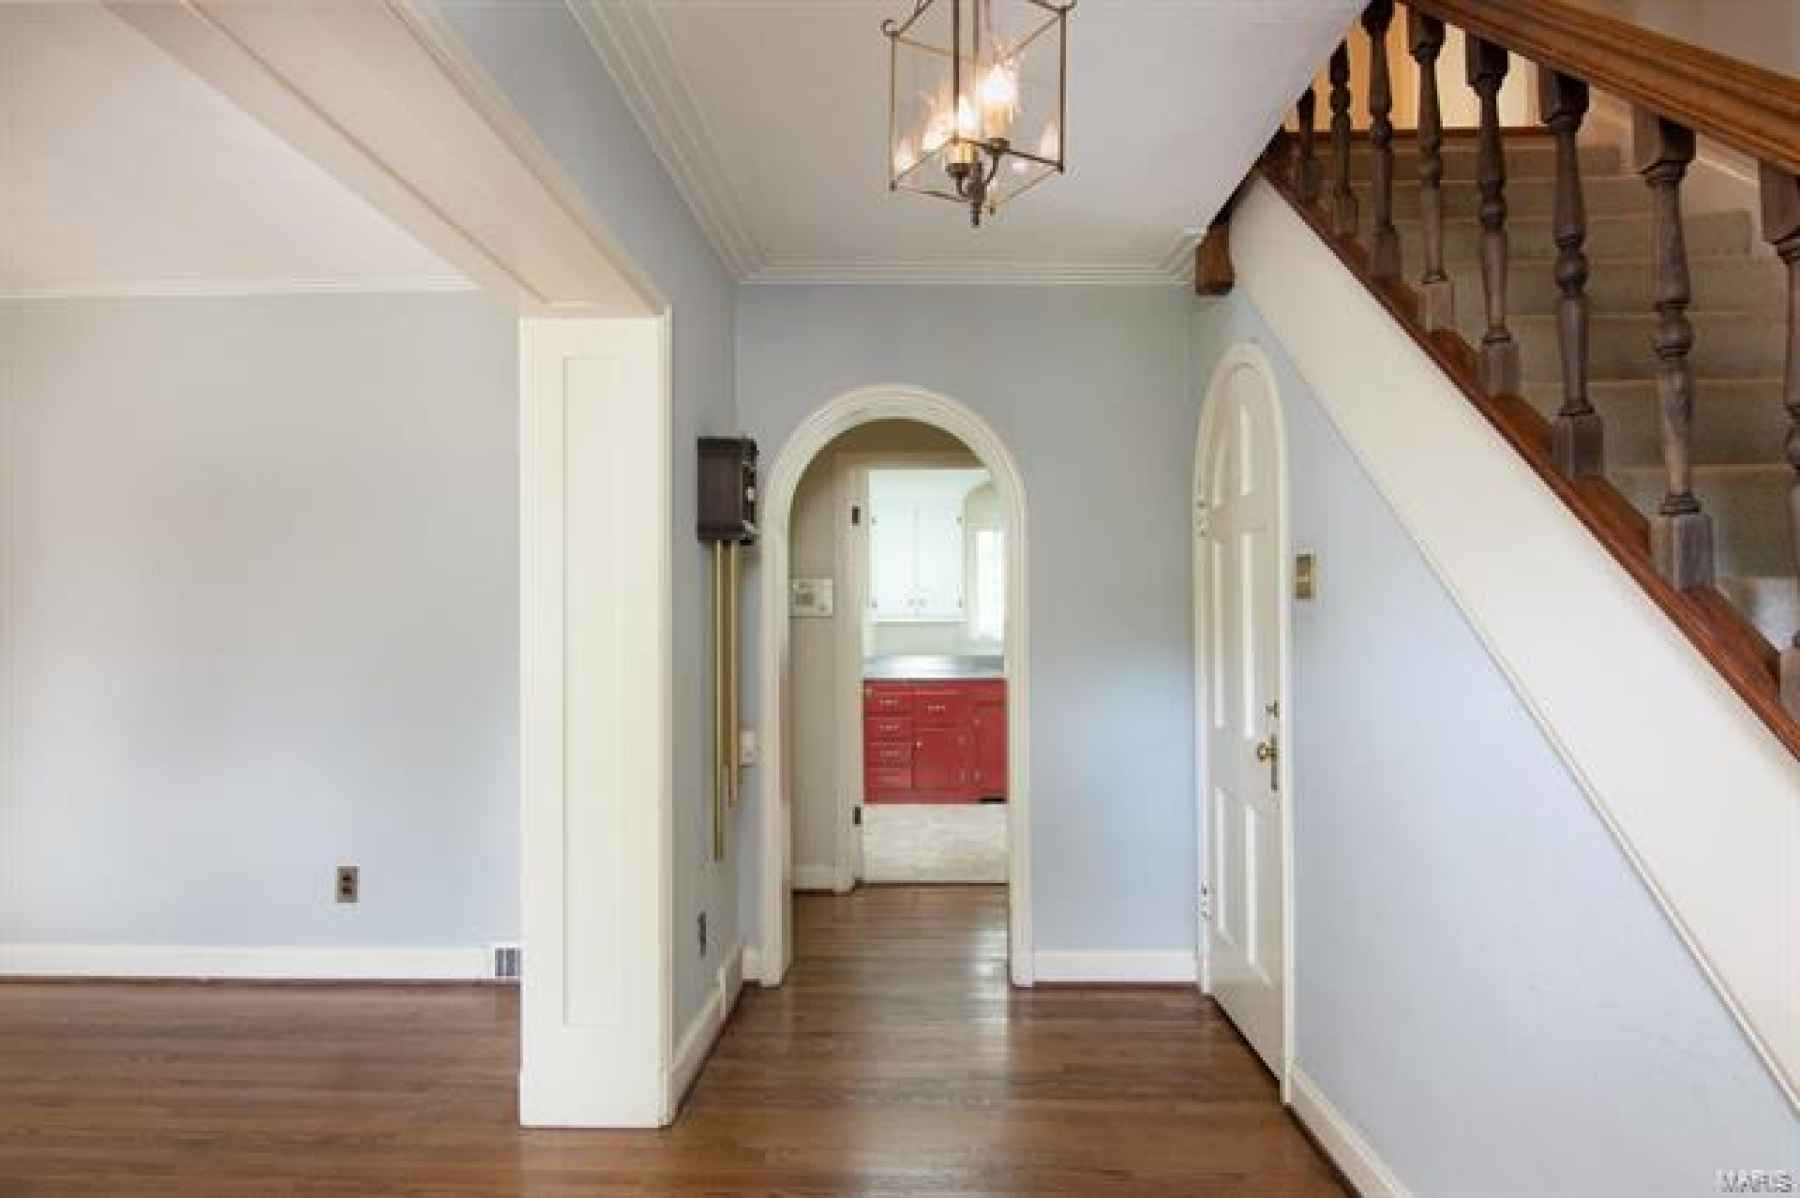 Entryway - Beautiful Hardwood Floors, Arched Doors, & Crown Molding